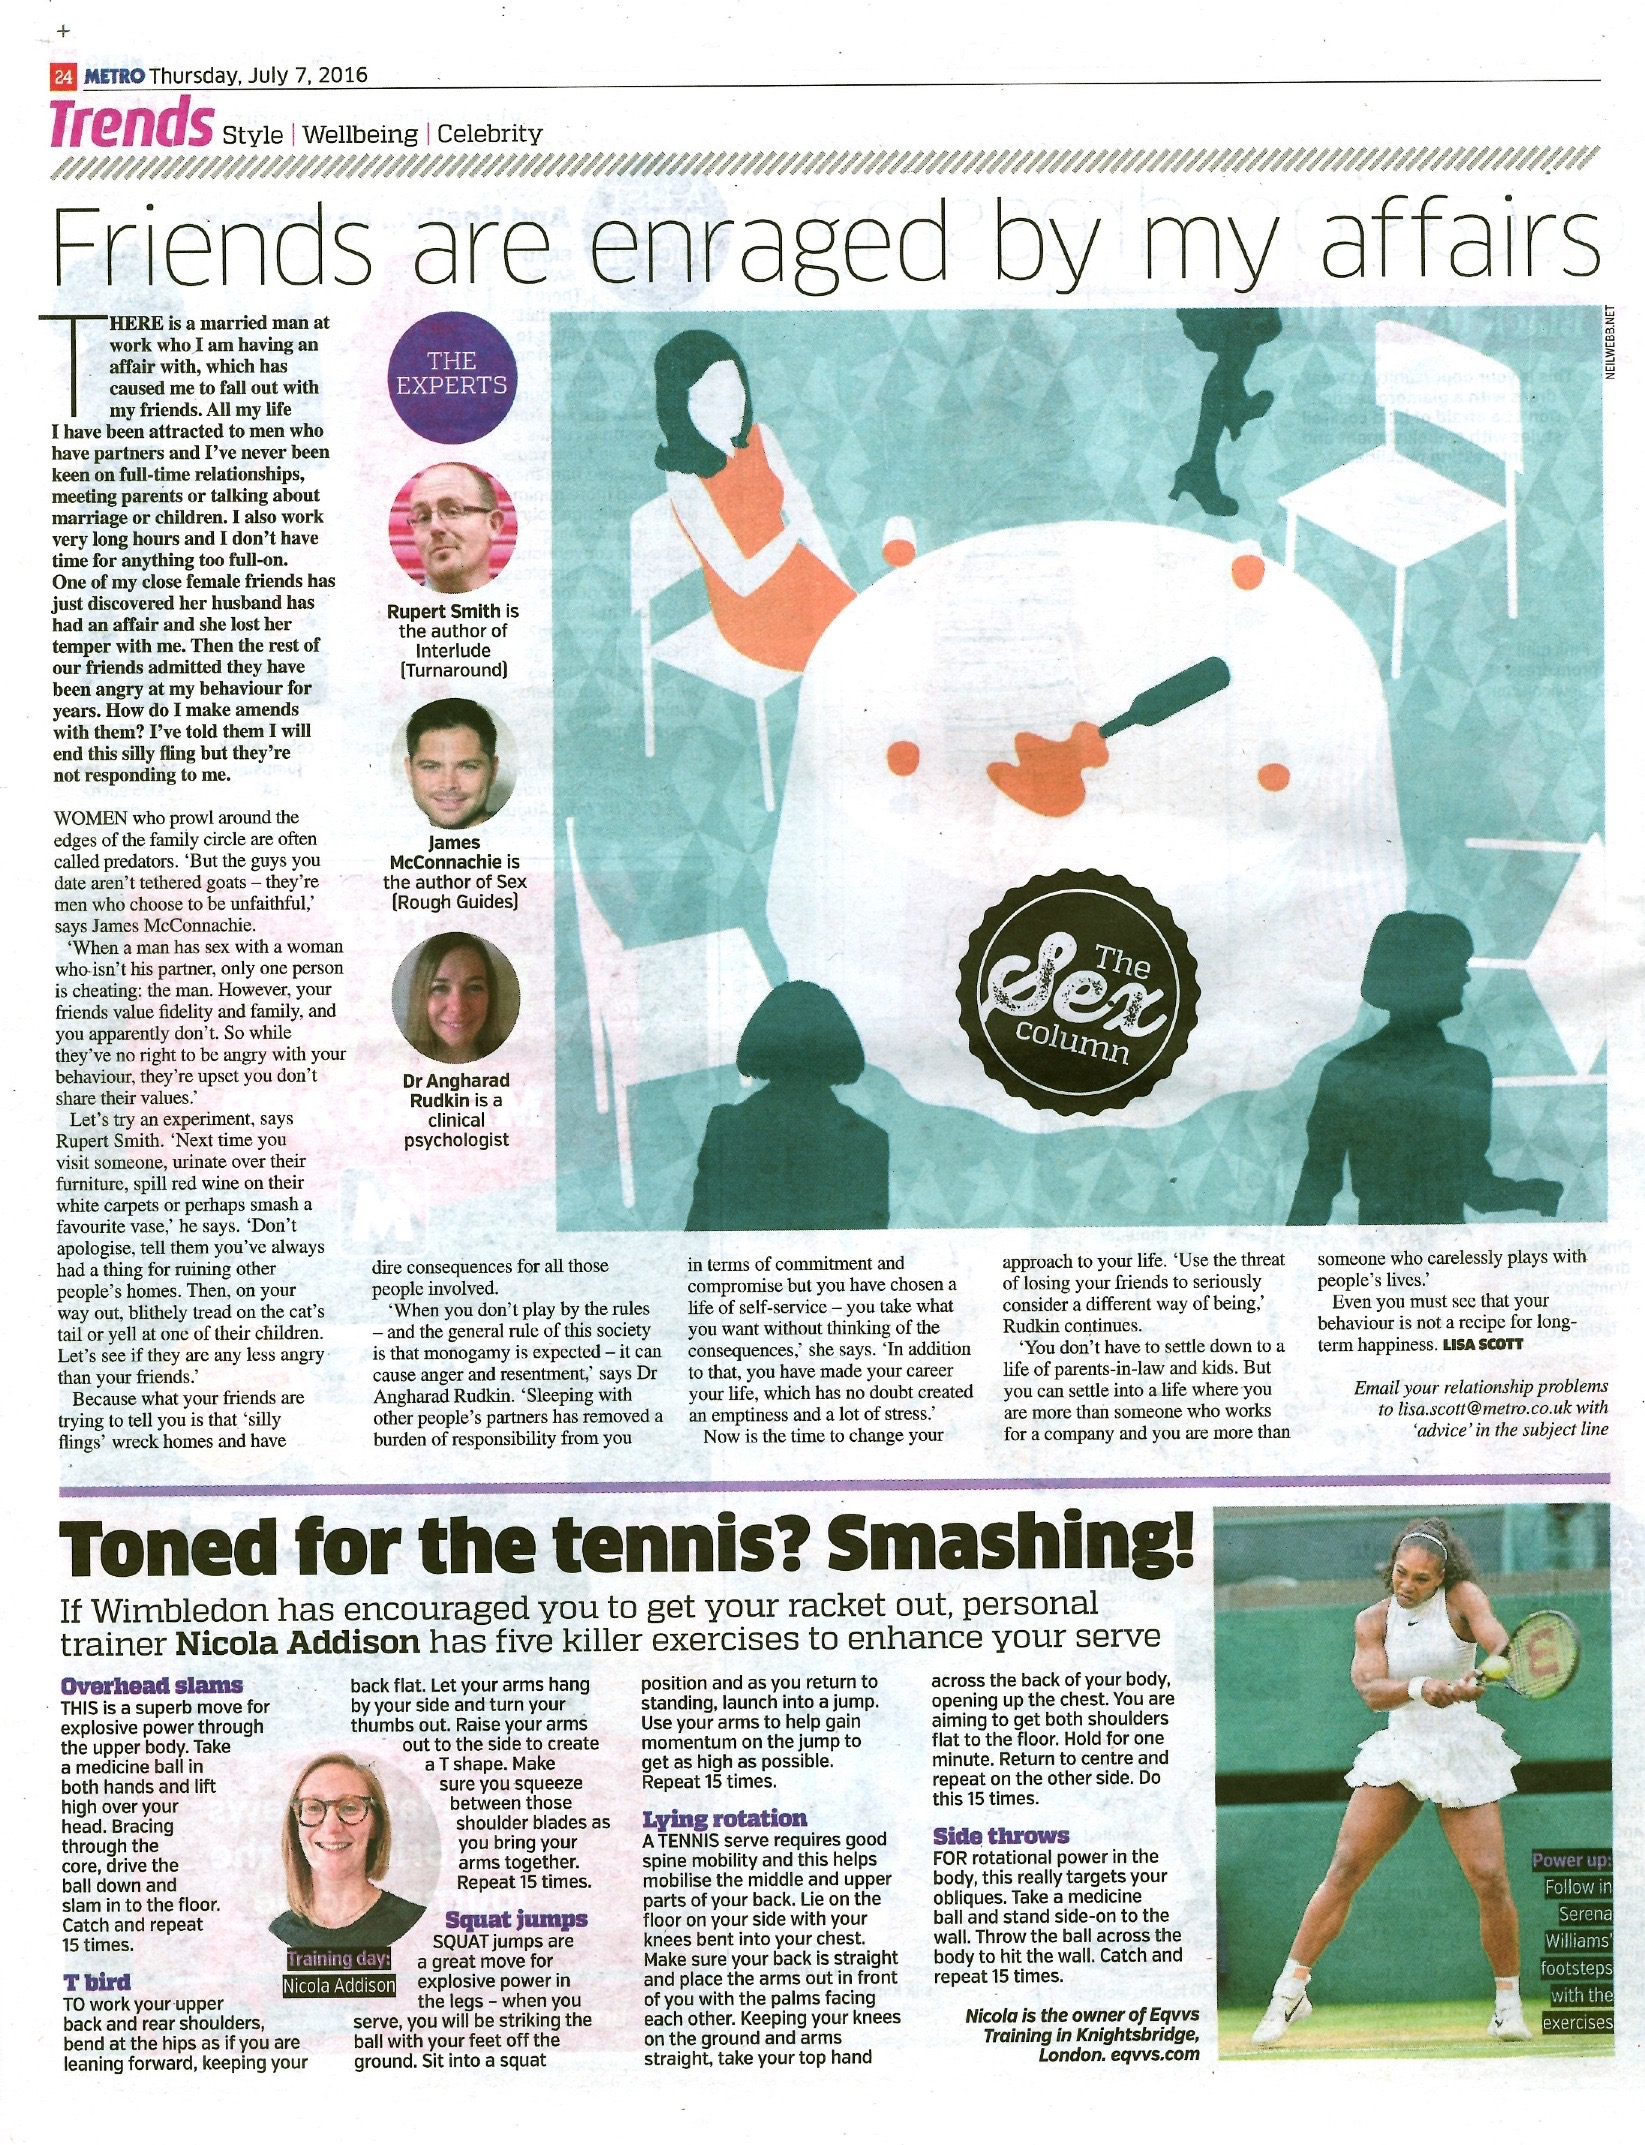 Metro Tennis